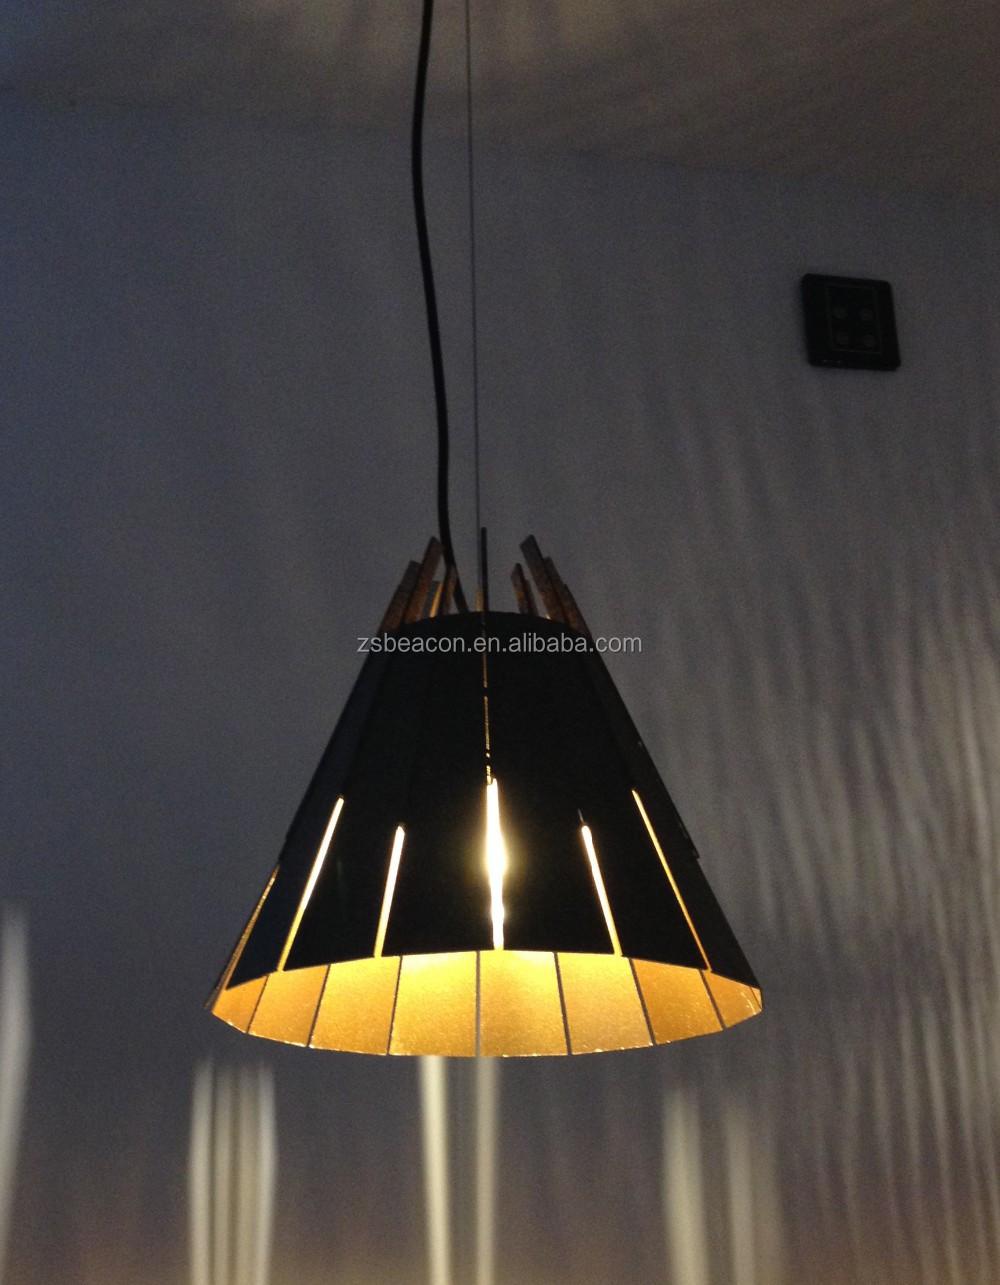 2016 Hot Sale New Design Moroccan Lighting Bronze Iron